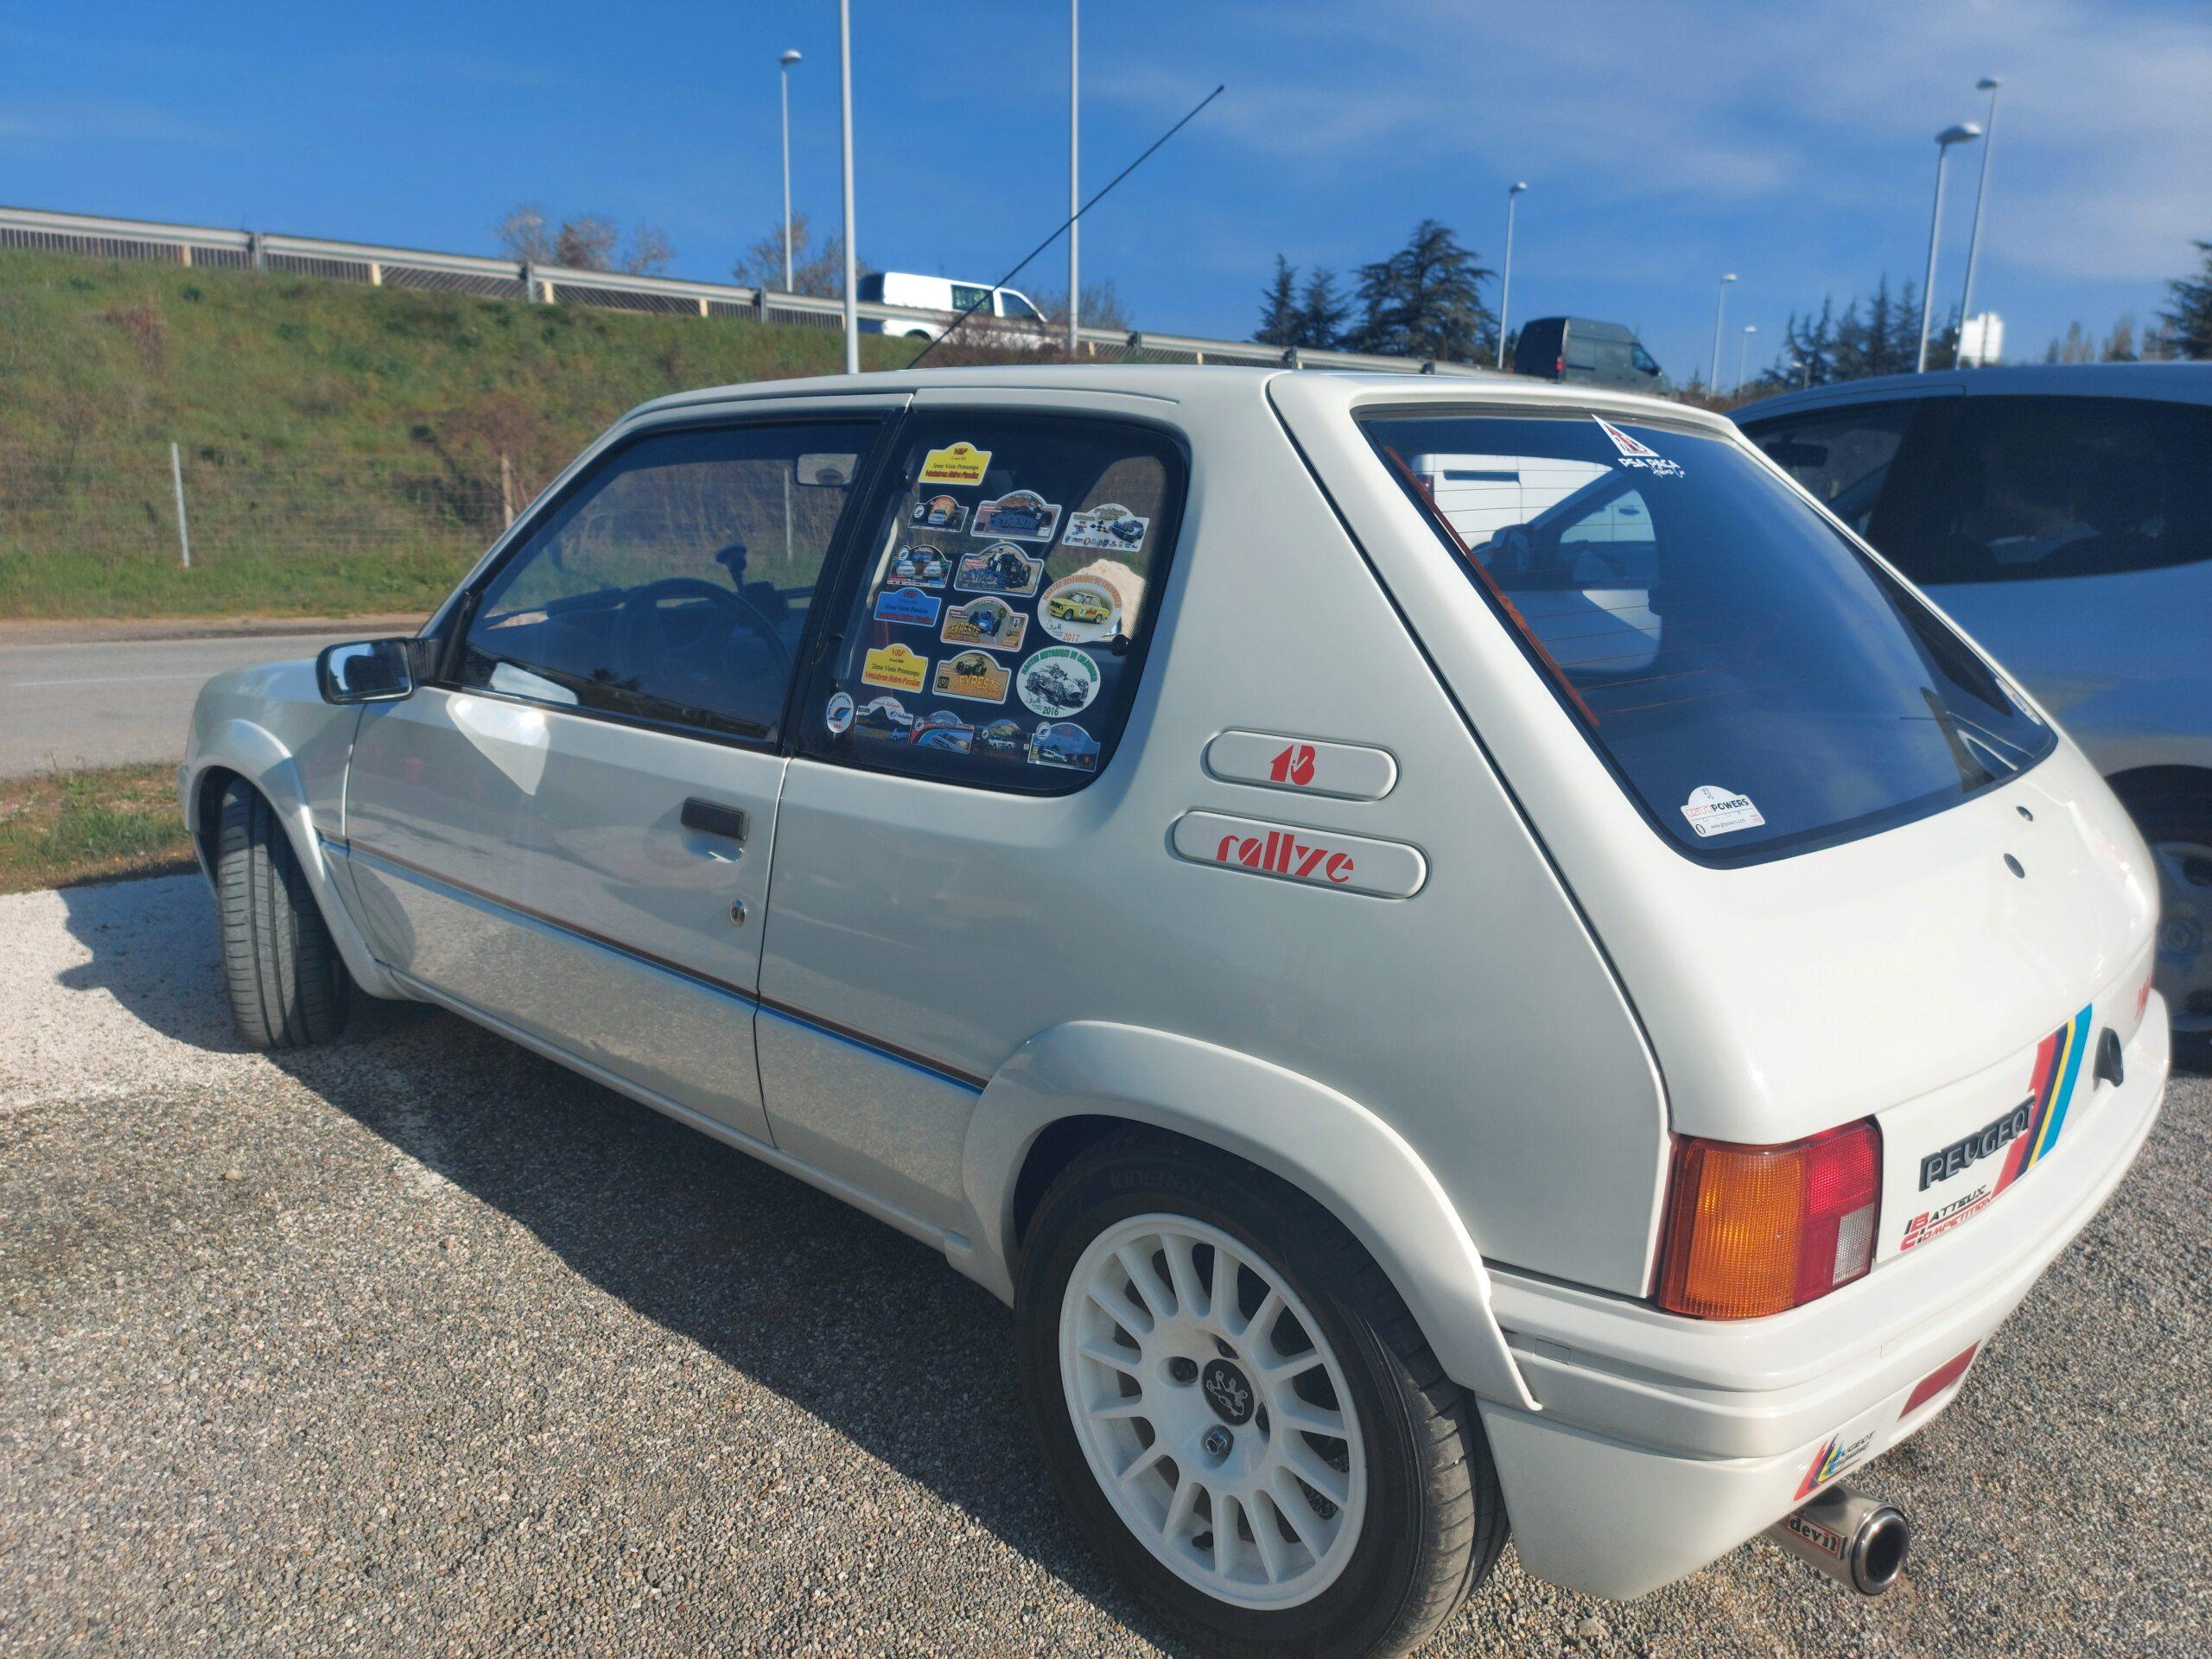 [jean-luc13] 205 Rallye Blanc Meije 1989 - Page 29 20210314